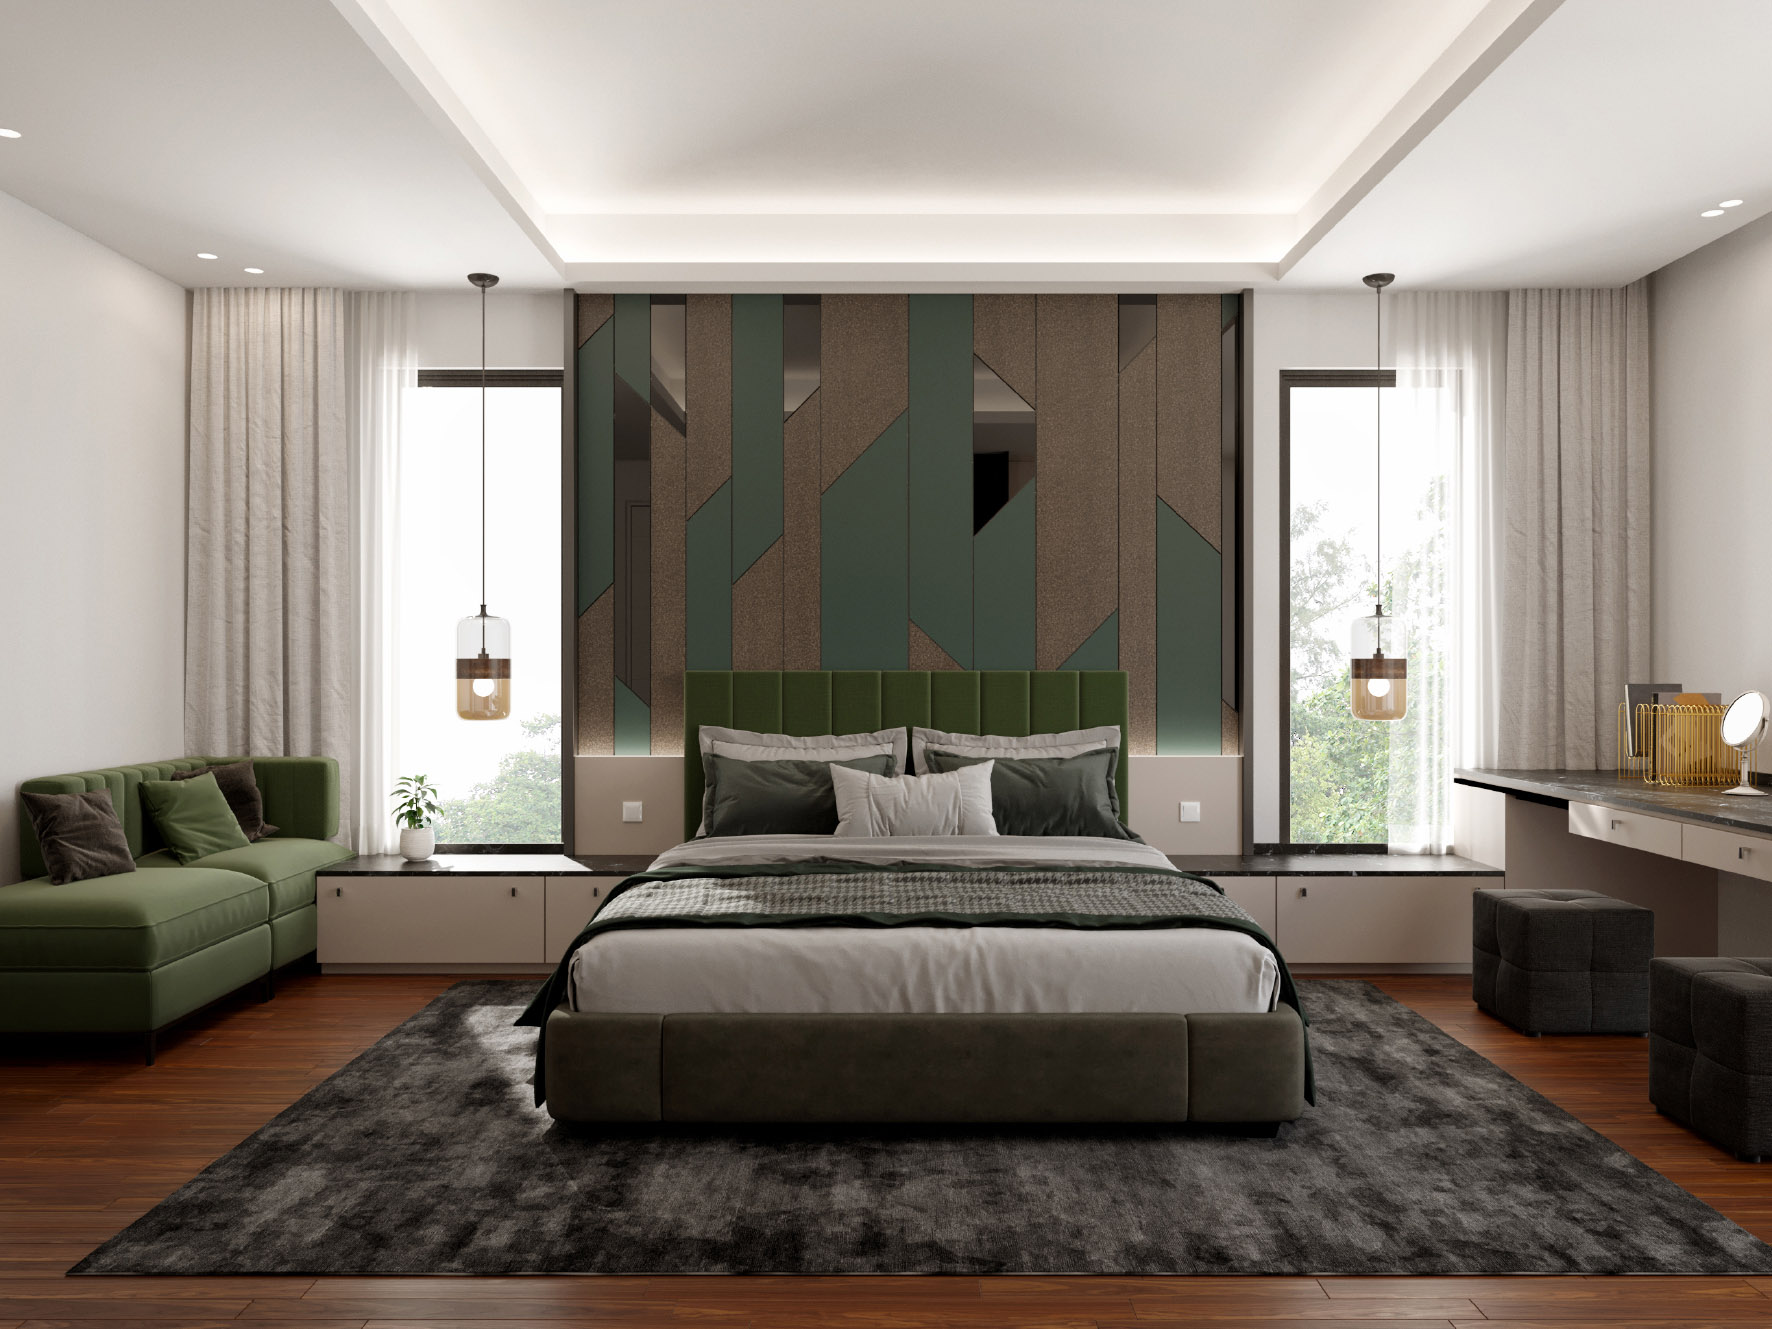 LV301 Bedroom 2